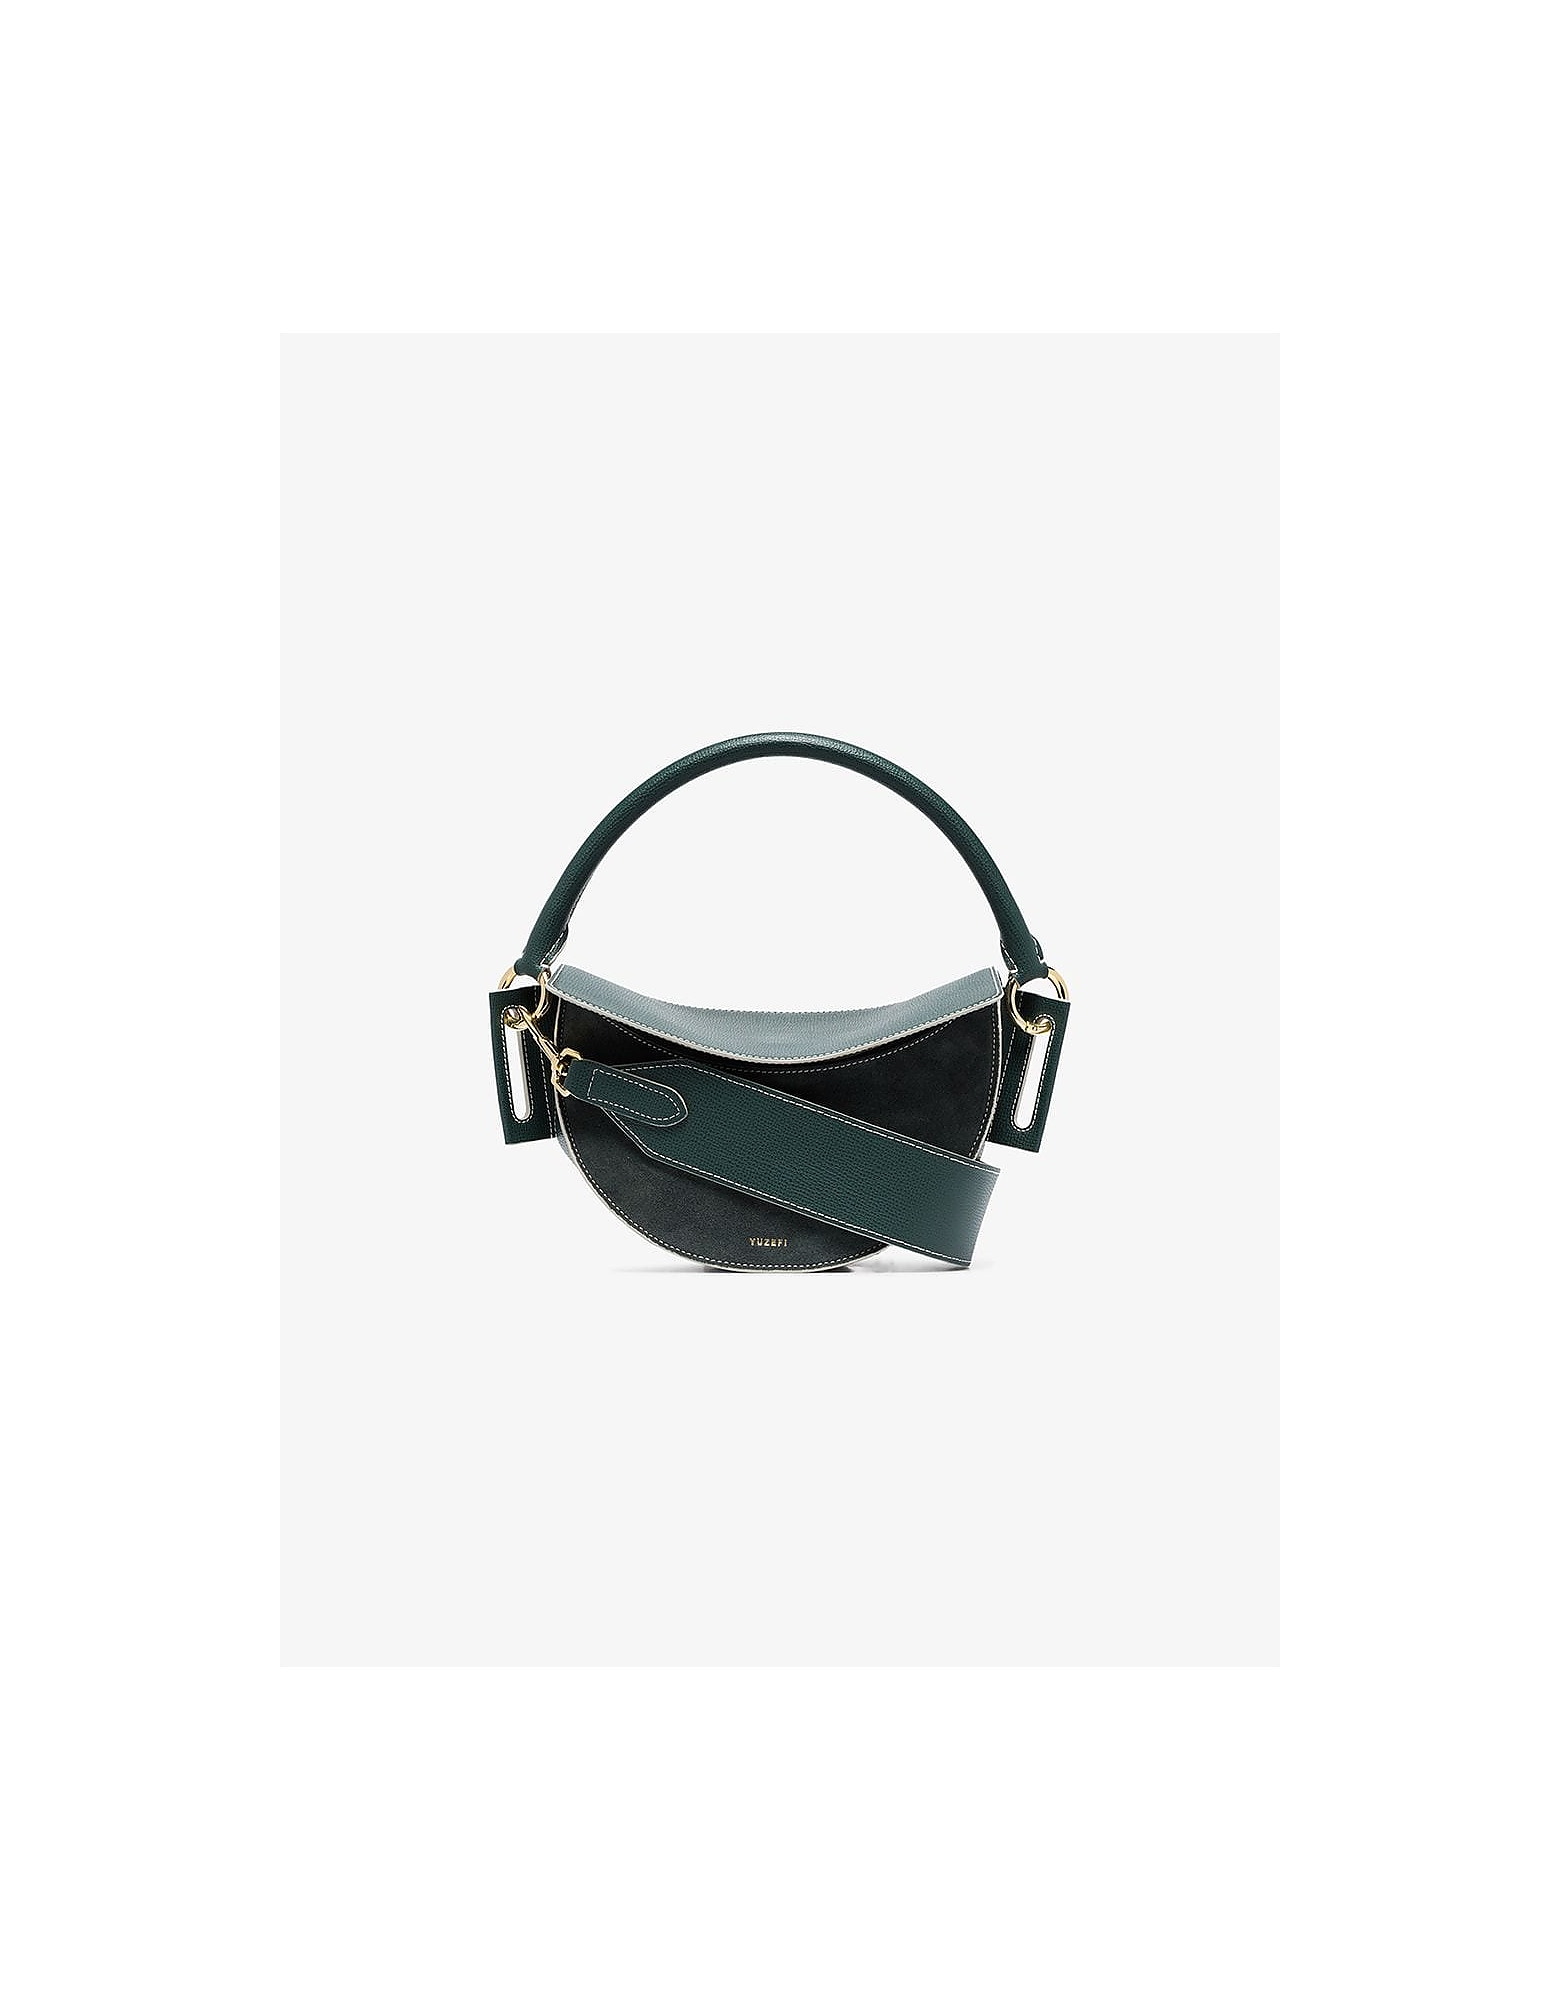 Yuzefi Designer Handbags, Pine Green Dip Leather Shoulder Bag